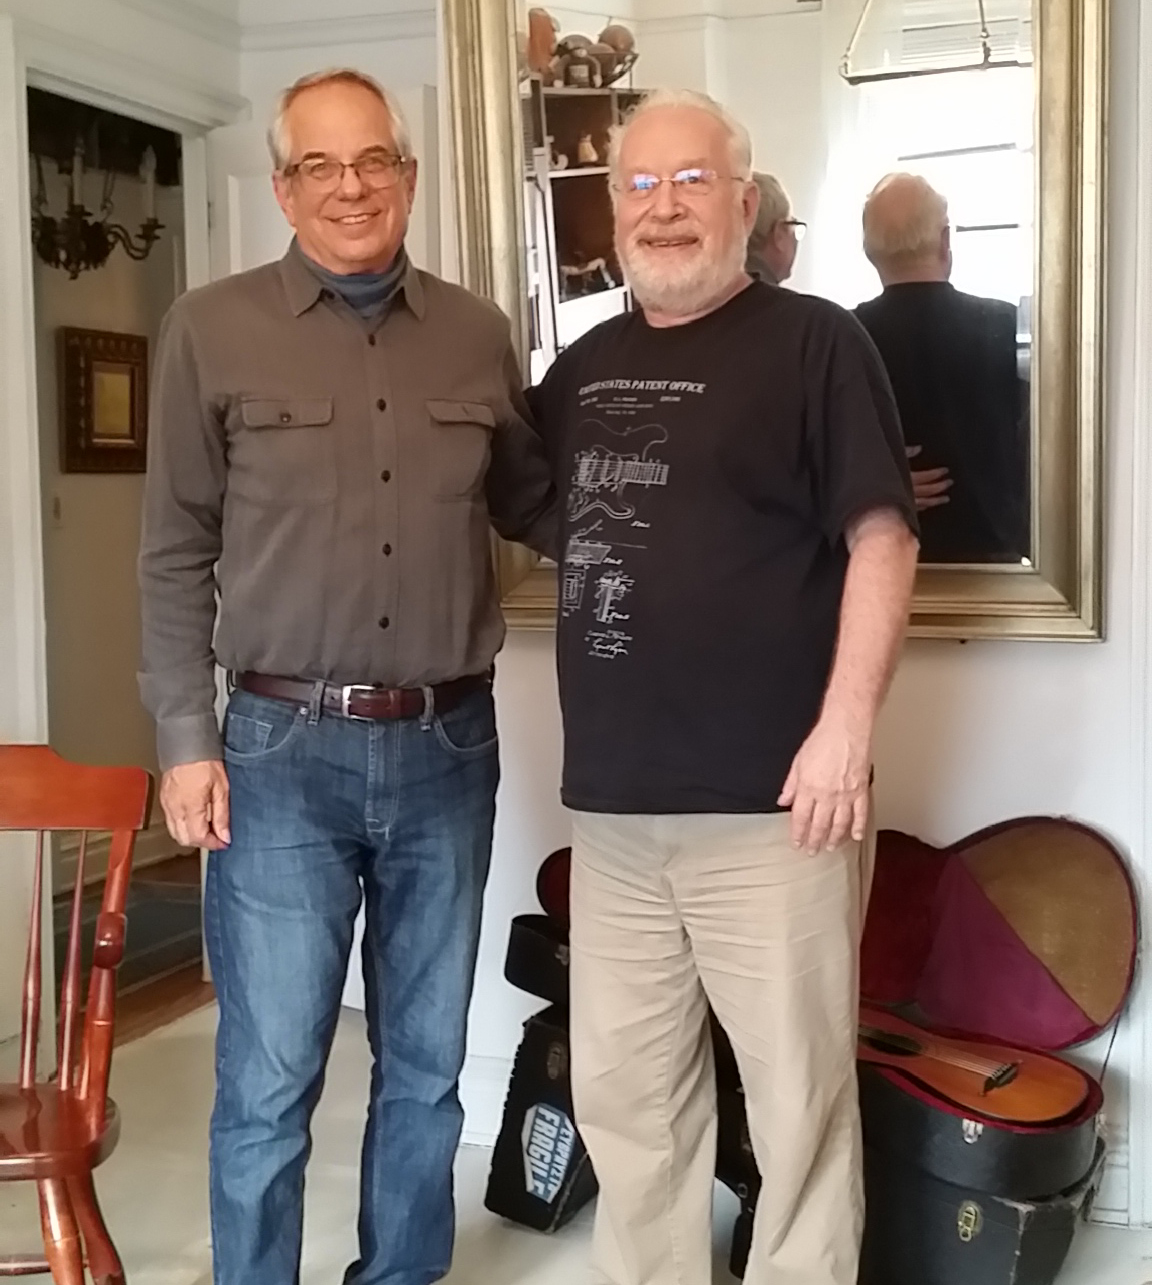 With Jerry Willard in New York City